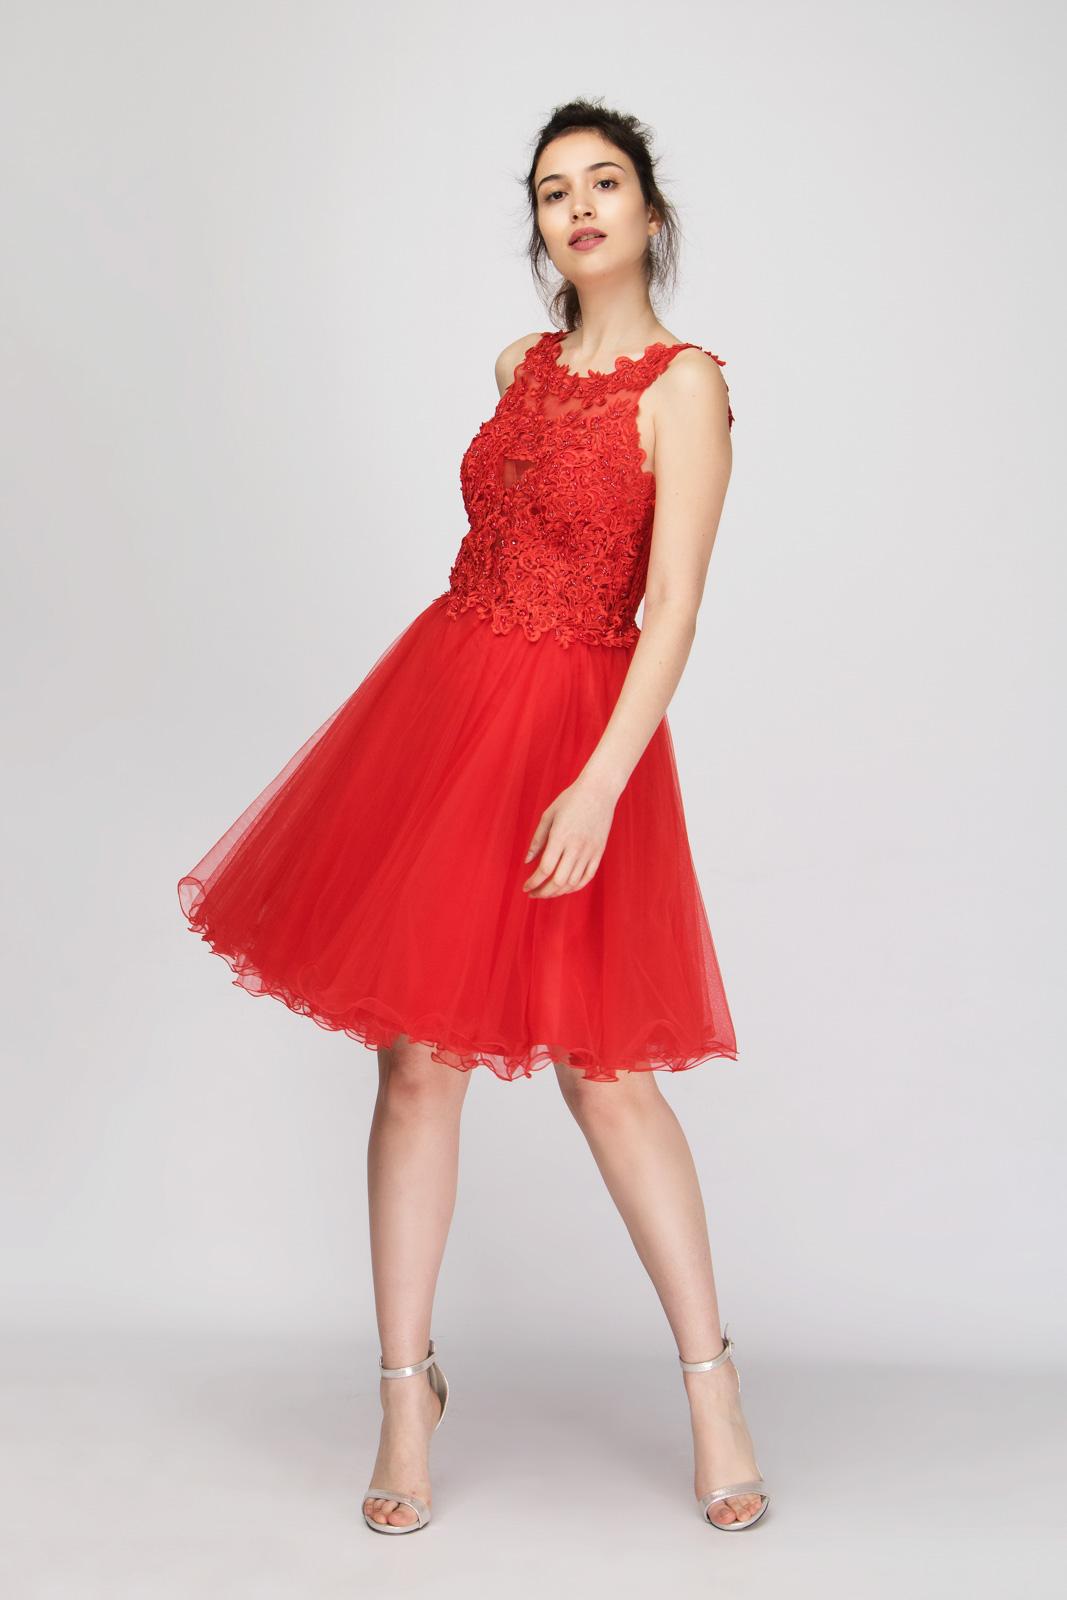 1381ef2b0b9 Φόρεμα με Τούλι και Δαντέλα